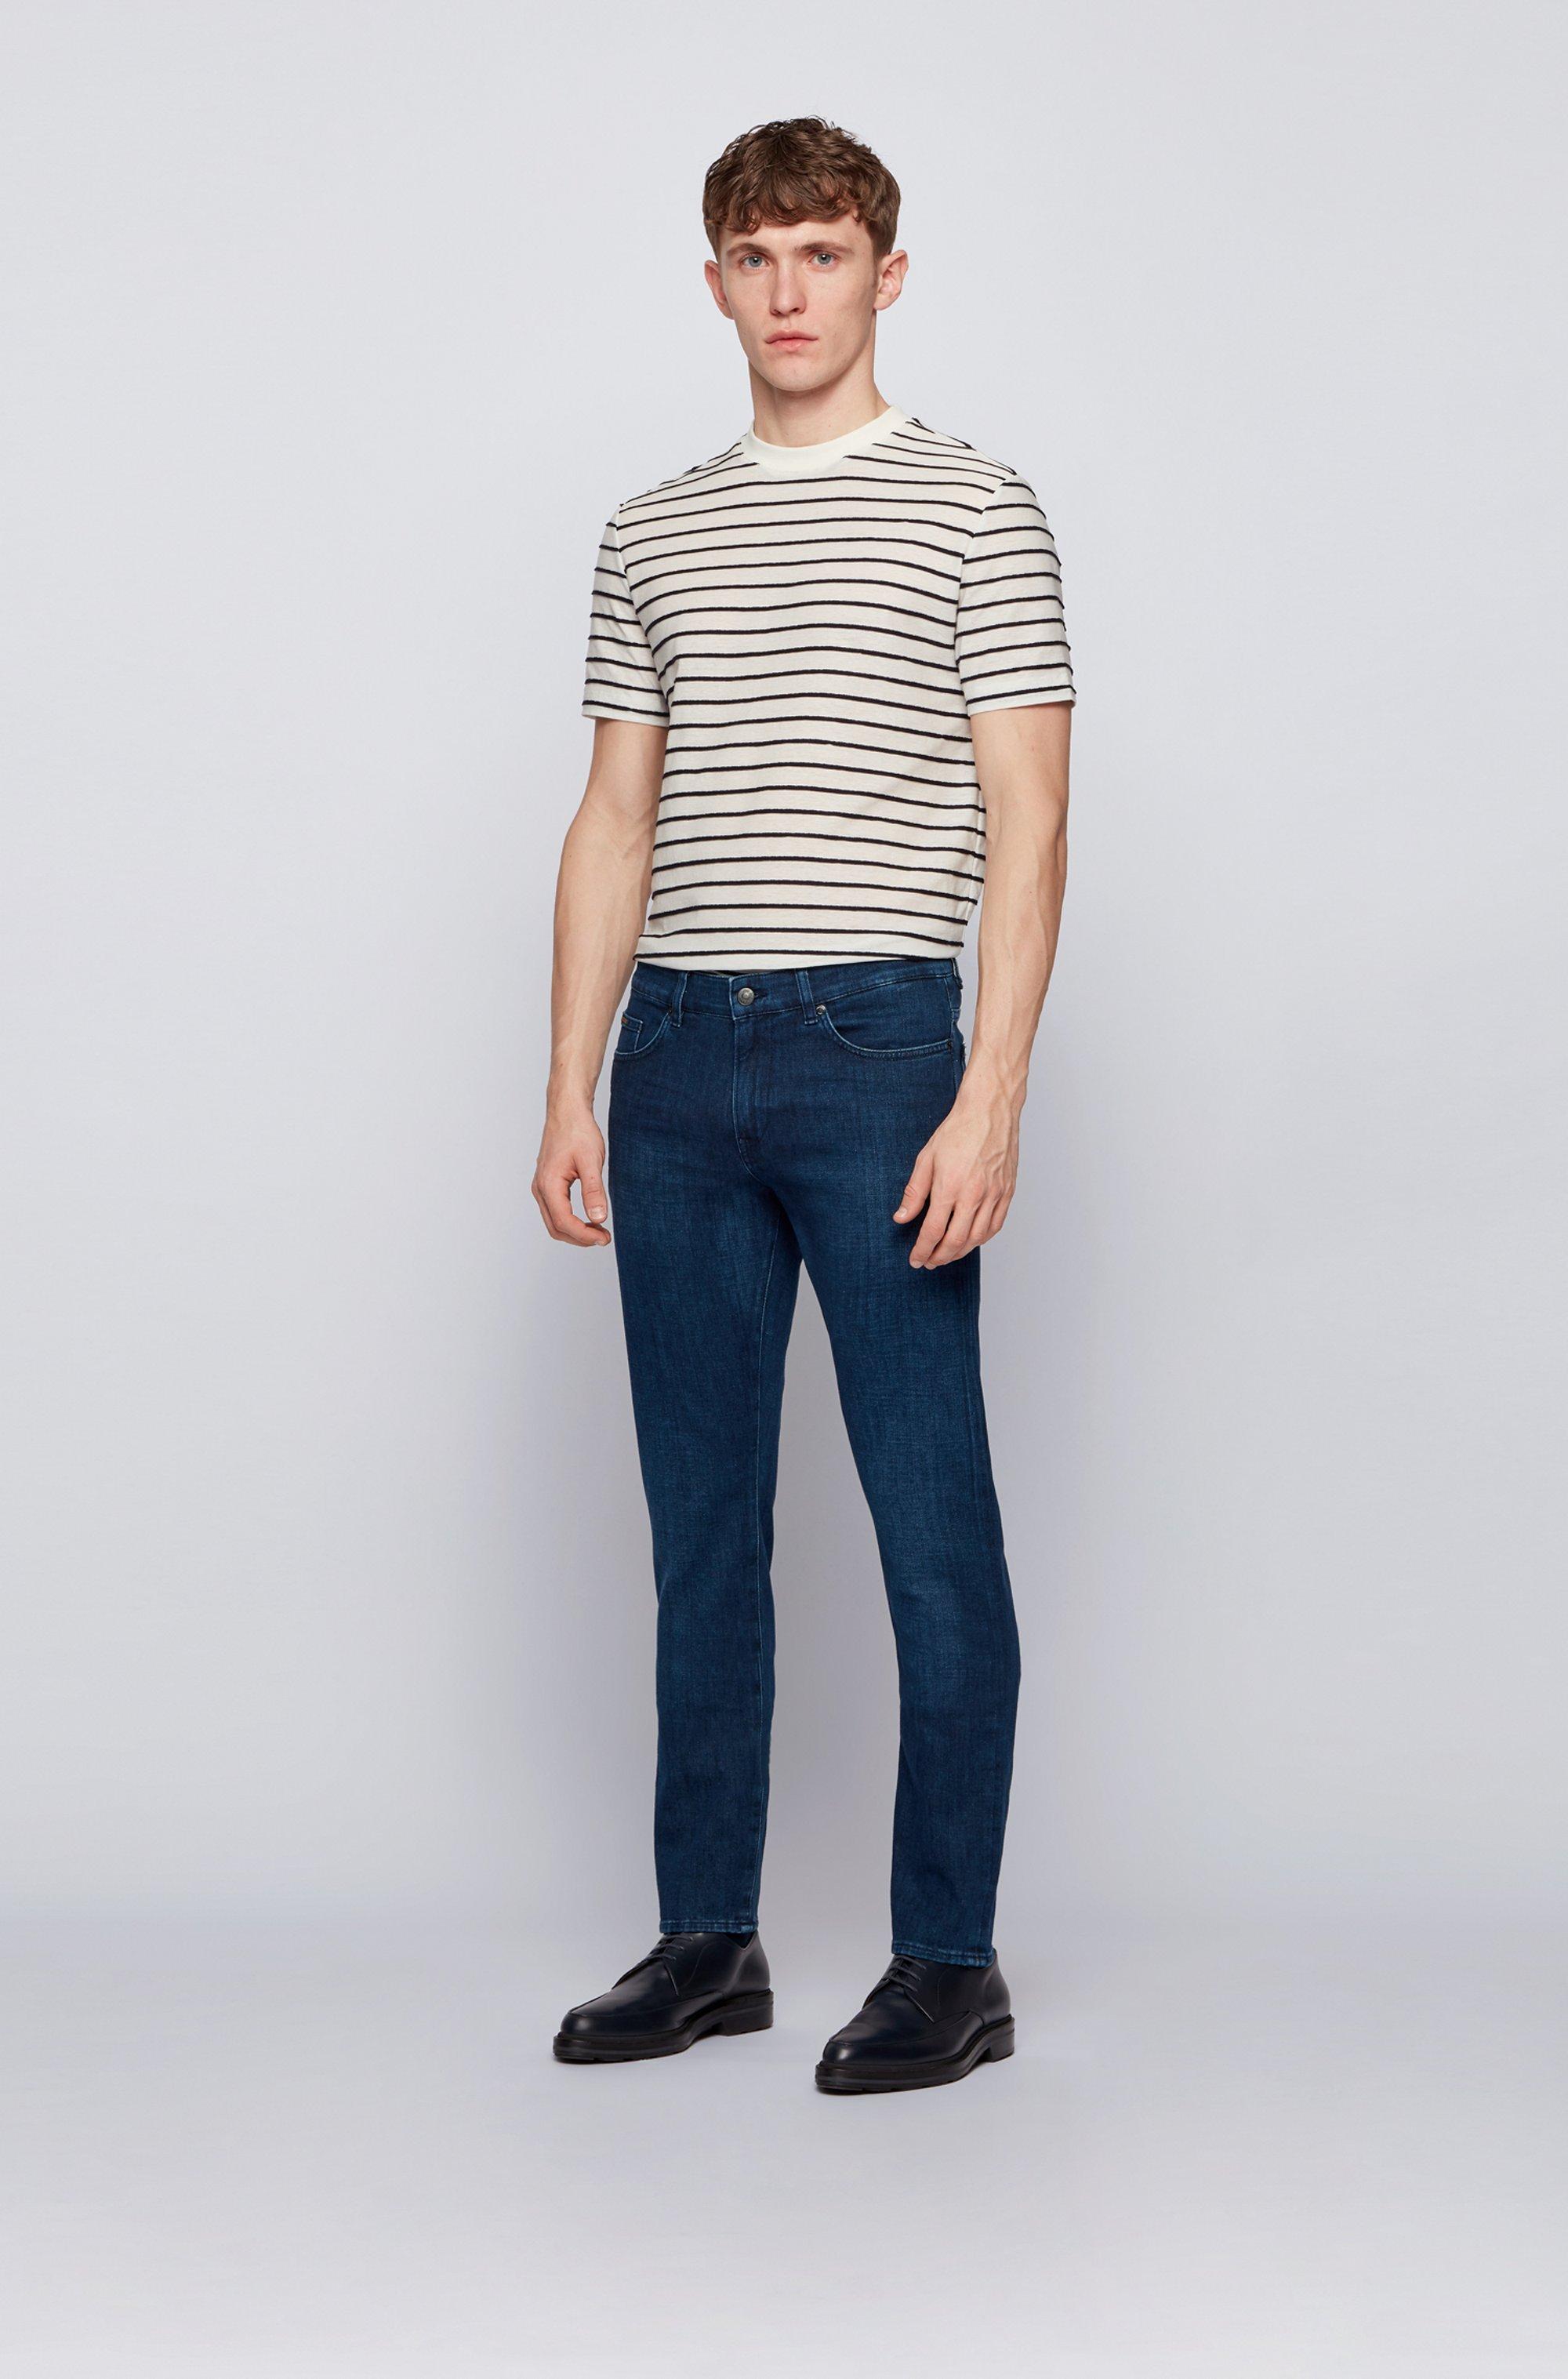 Slim-fit jeans in super-soft navy stretch denim